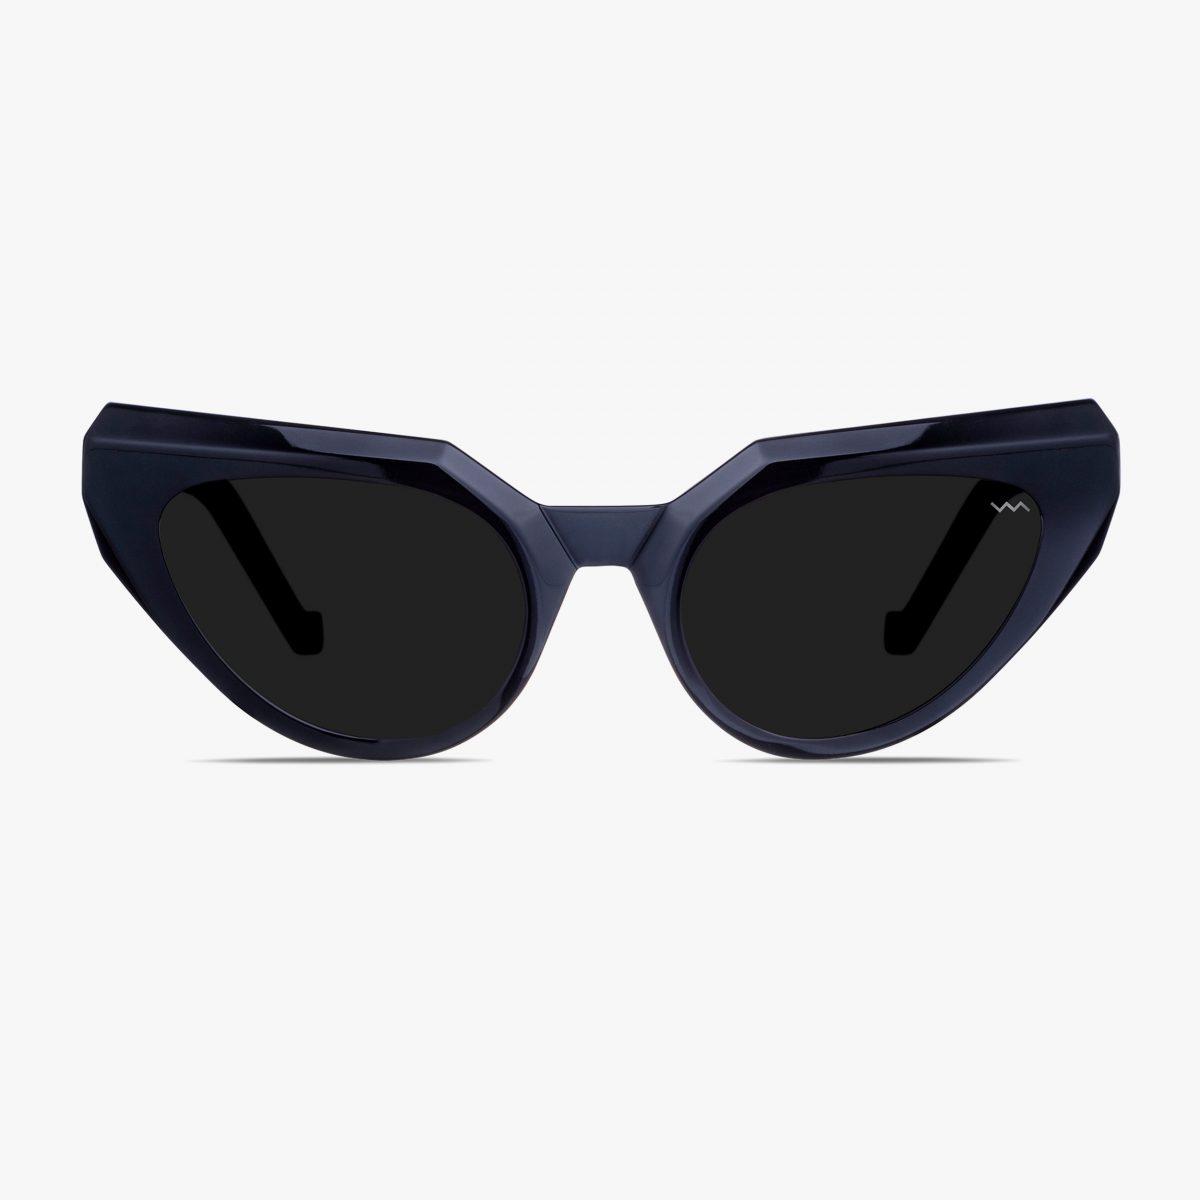 vava bl0028 black sunglass online shop